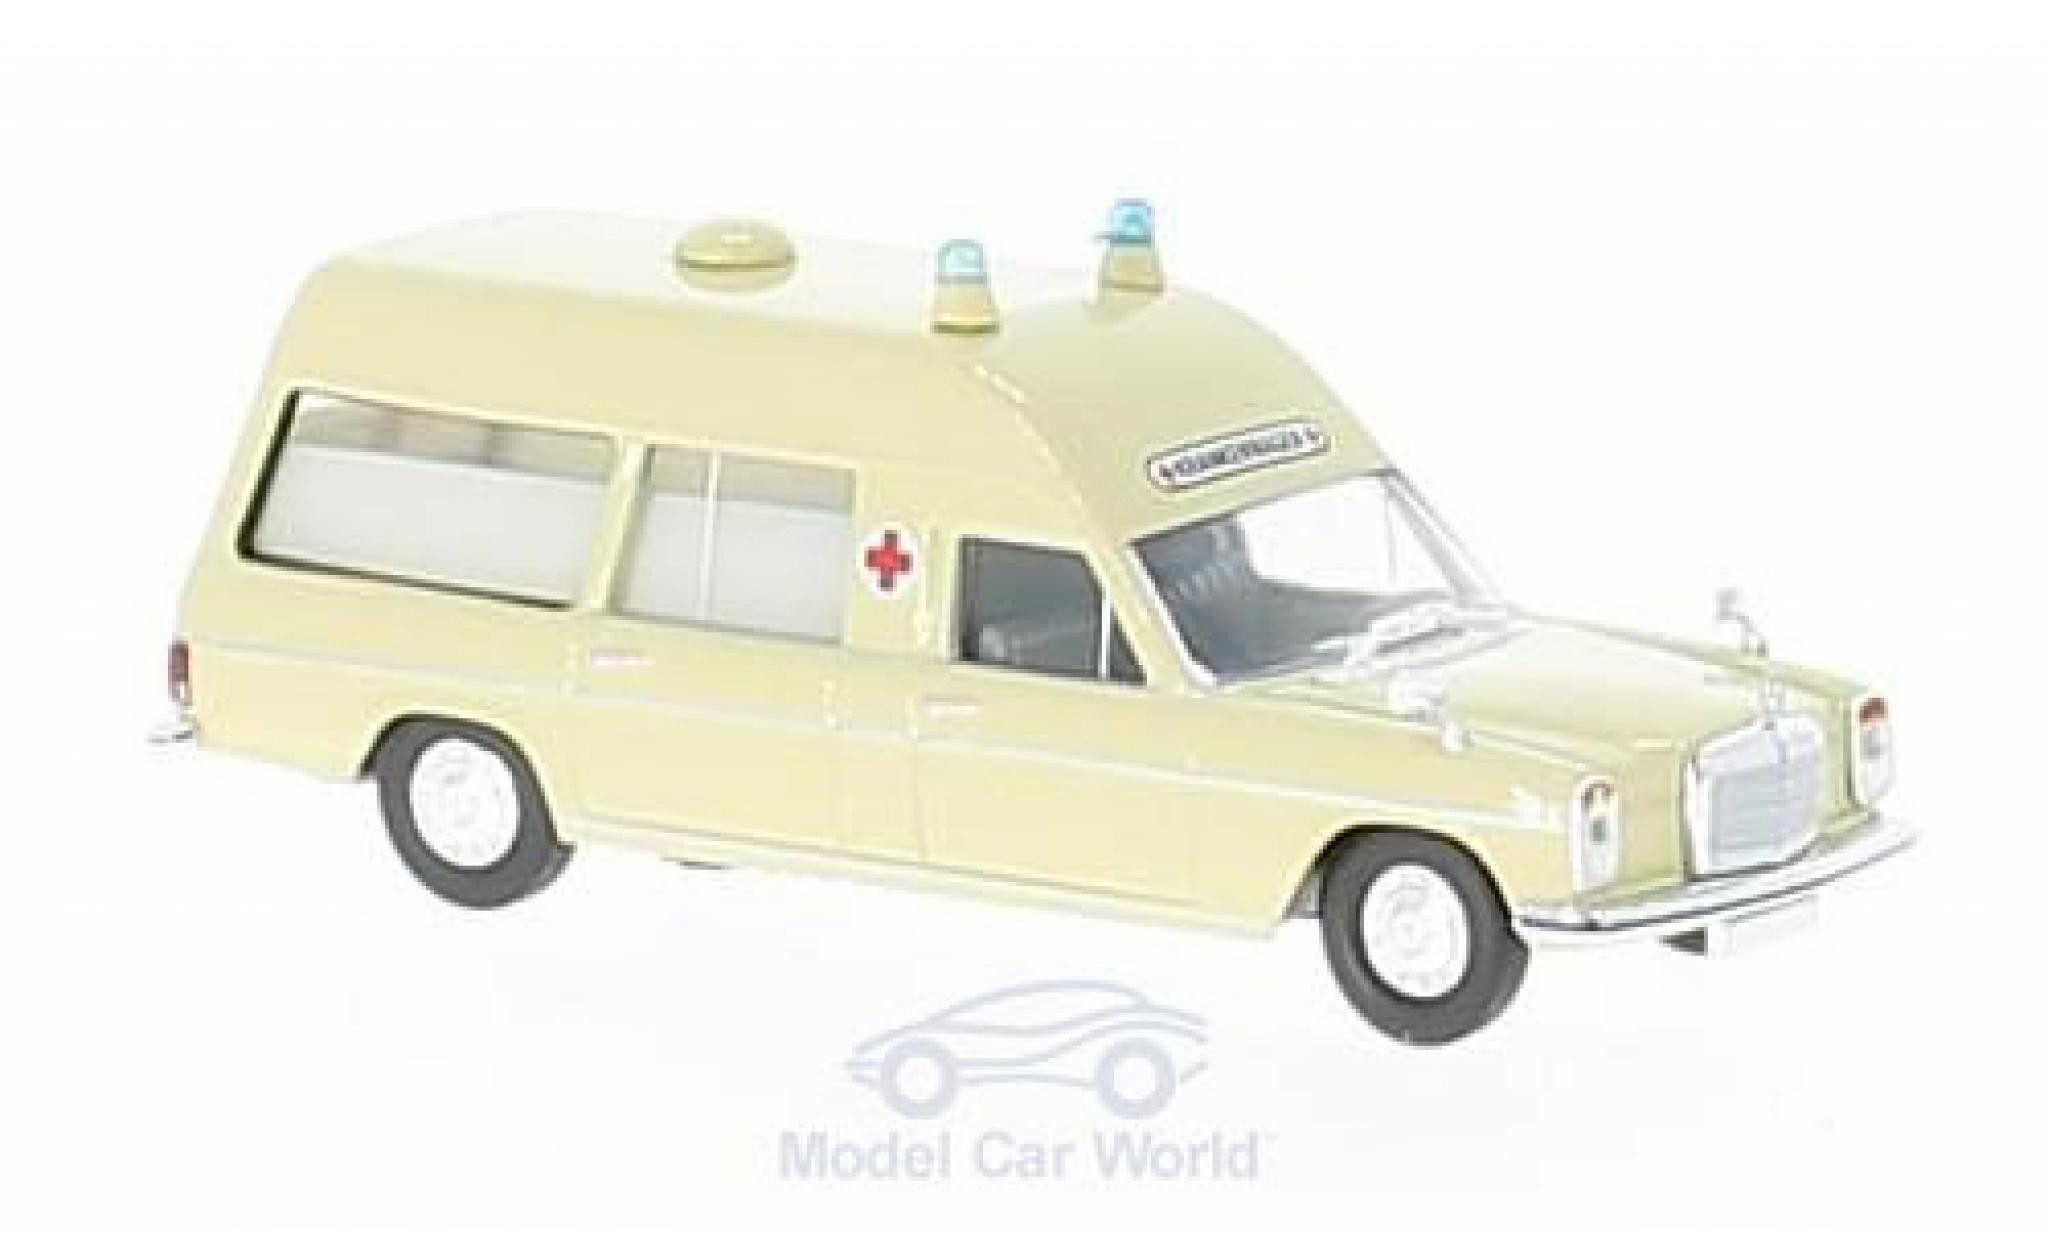 Mercedes /8 1/87 Brekina Starmada beige Krankenwagen ohne Vitrine